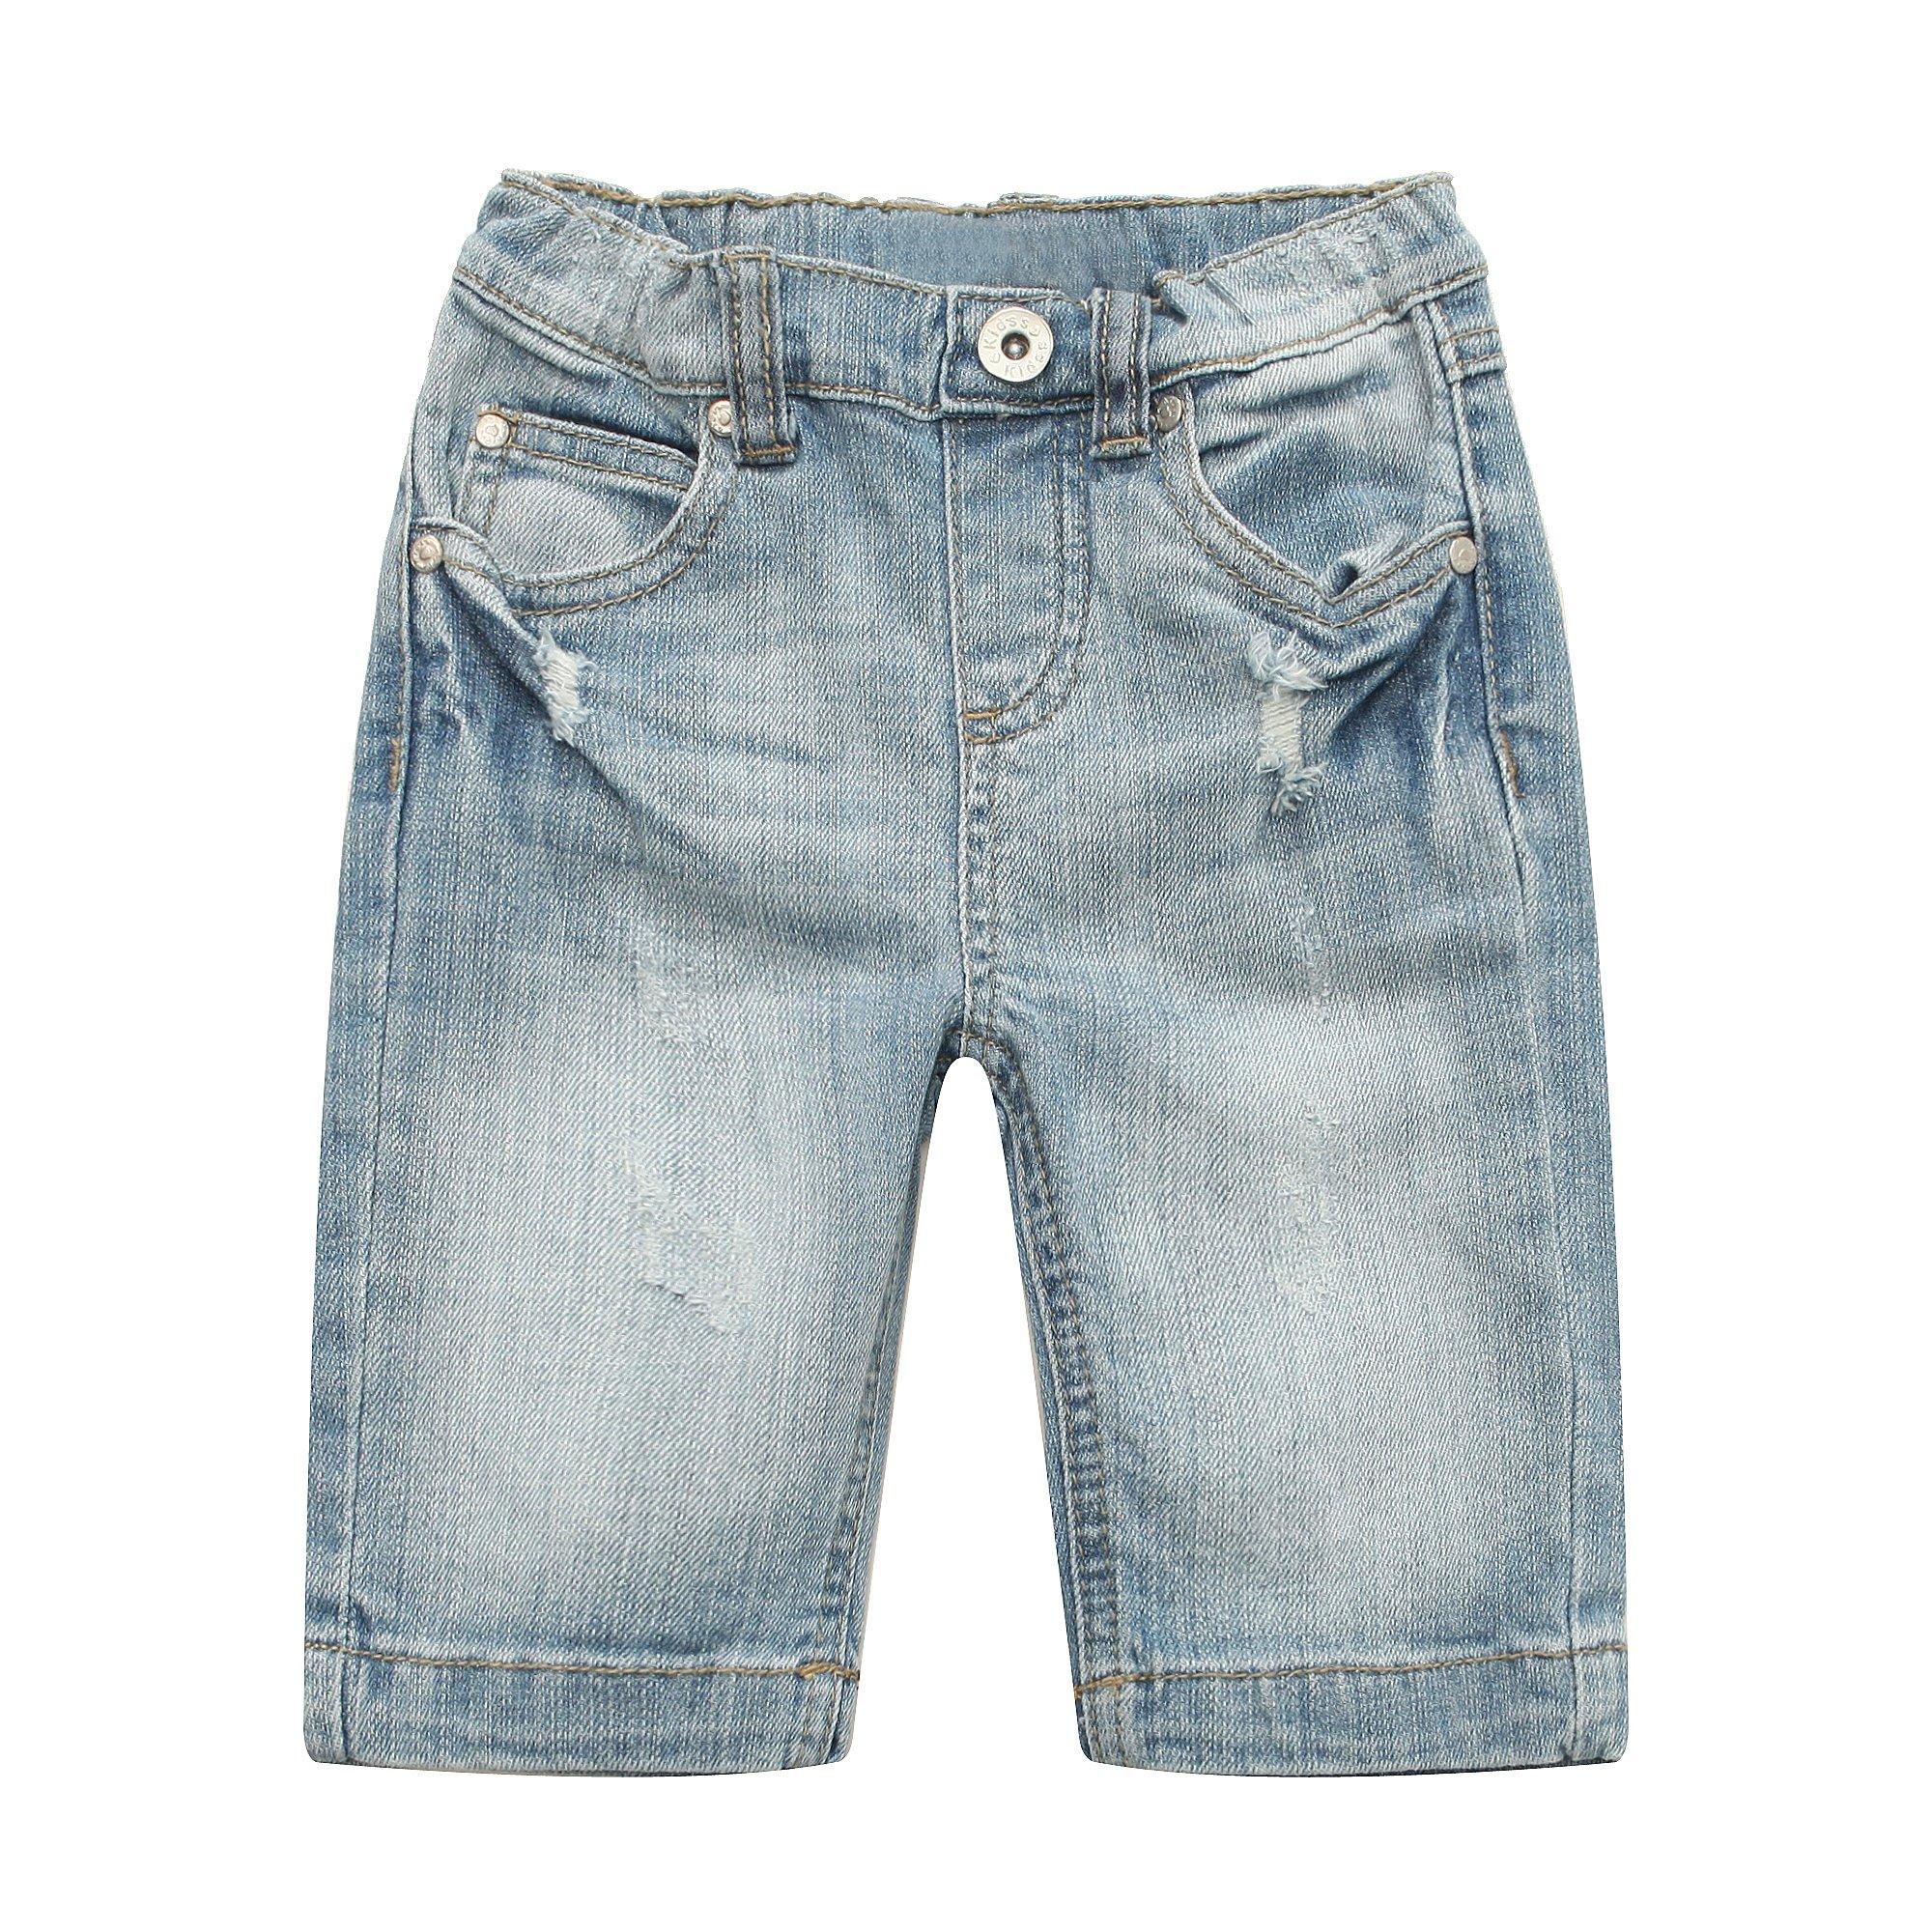 Richie House Girl's Middle Denim Pants RH1819-A-5/6